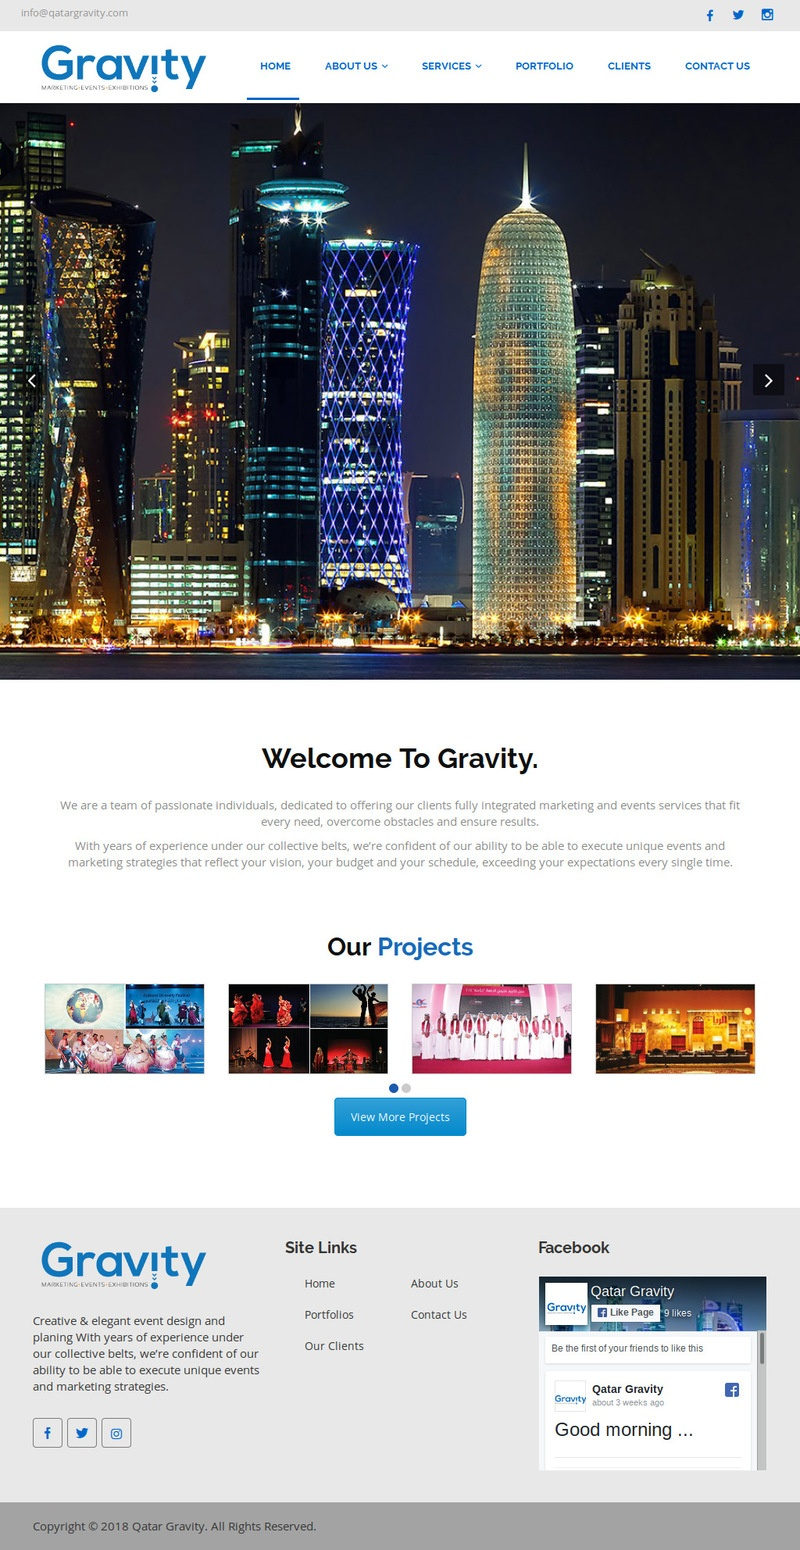 qatar-gravity-web-qatar